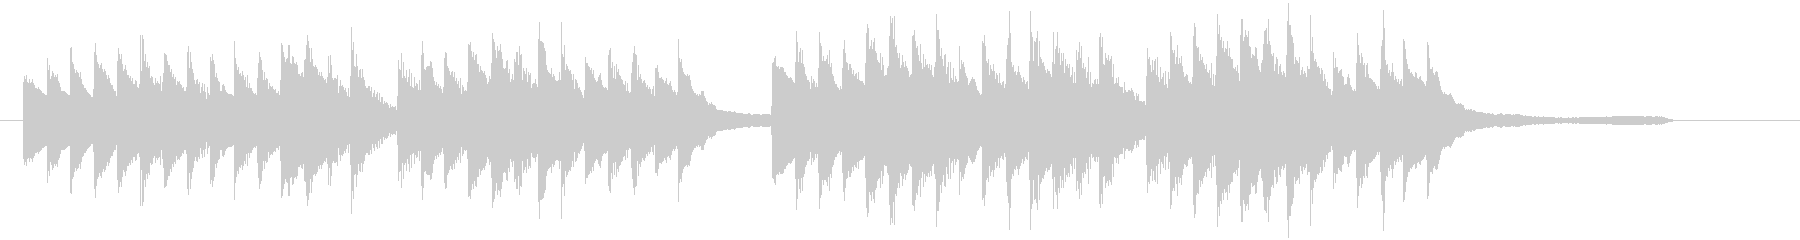 CM30秒、優しく感動的なピアノソロ13の未再生の波形